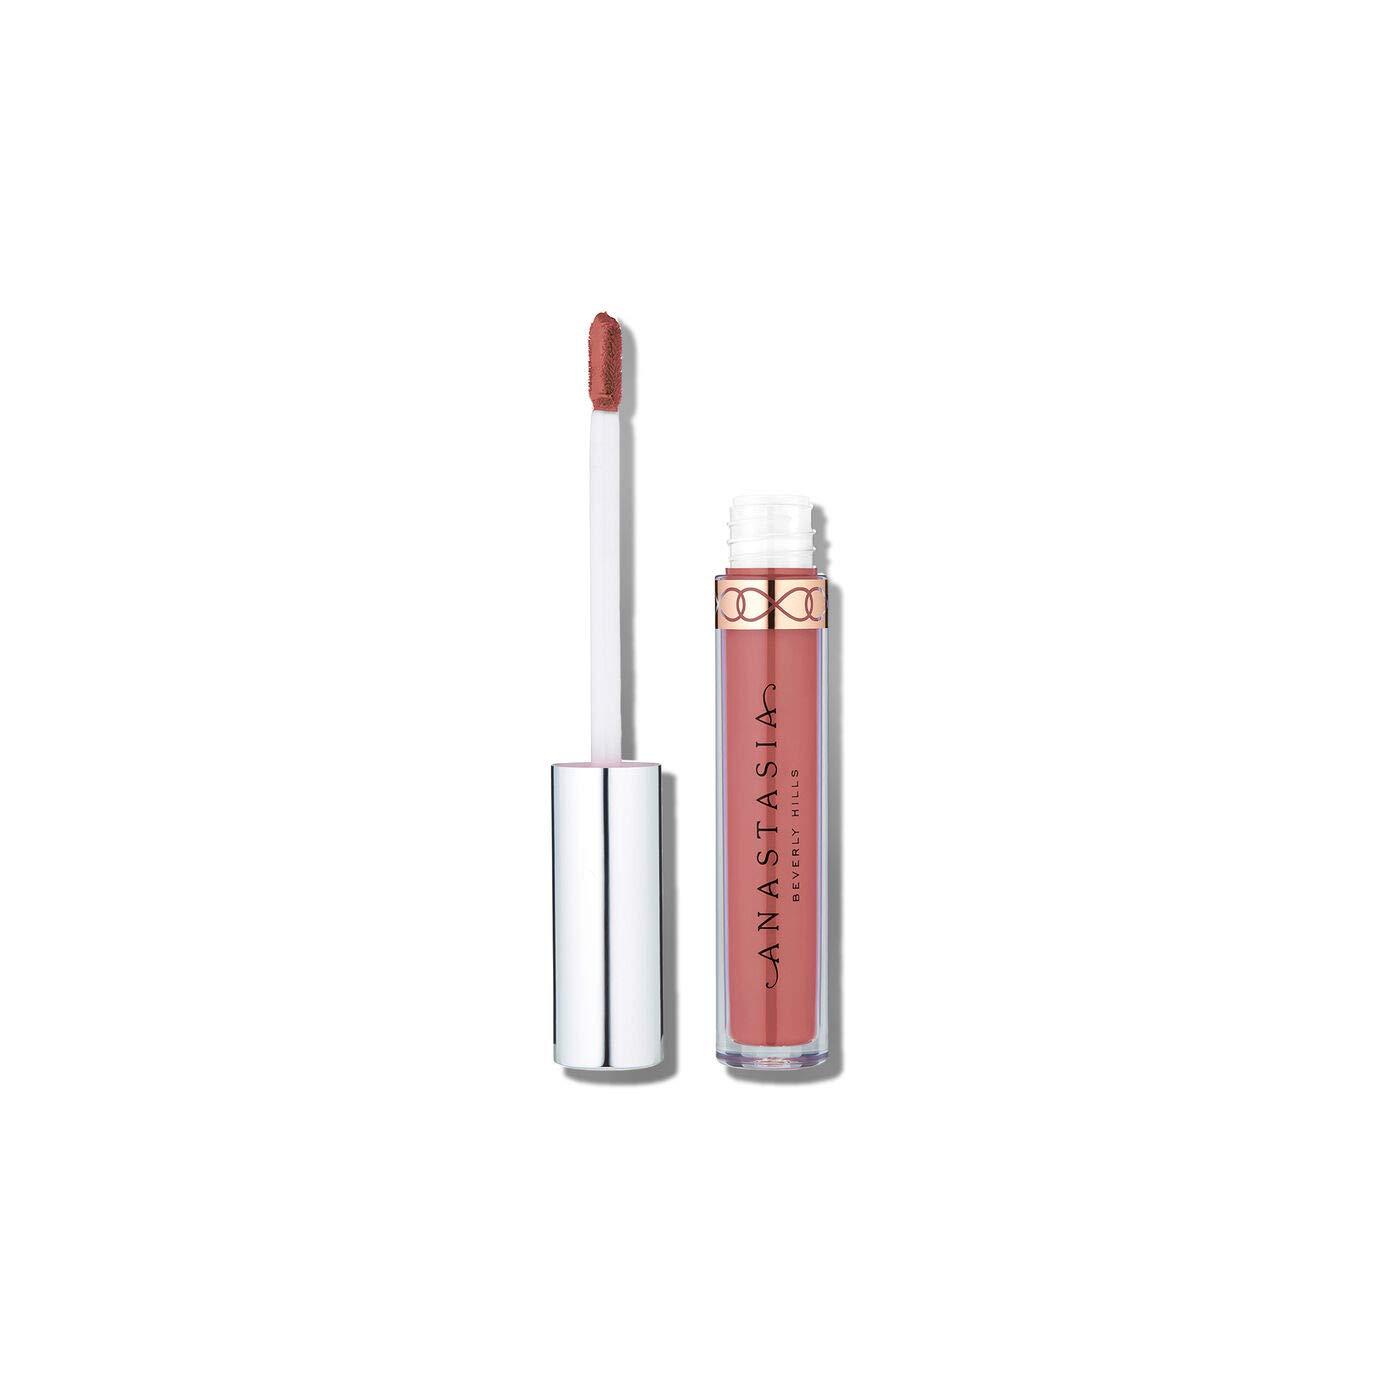 Anastasia Beverly Hills - Liquid Lipstick - Crush - Soft beige